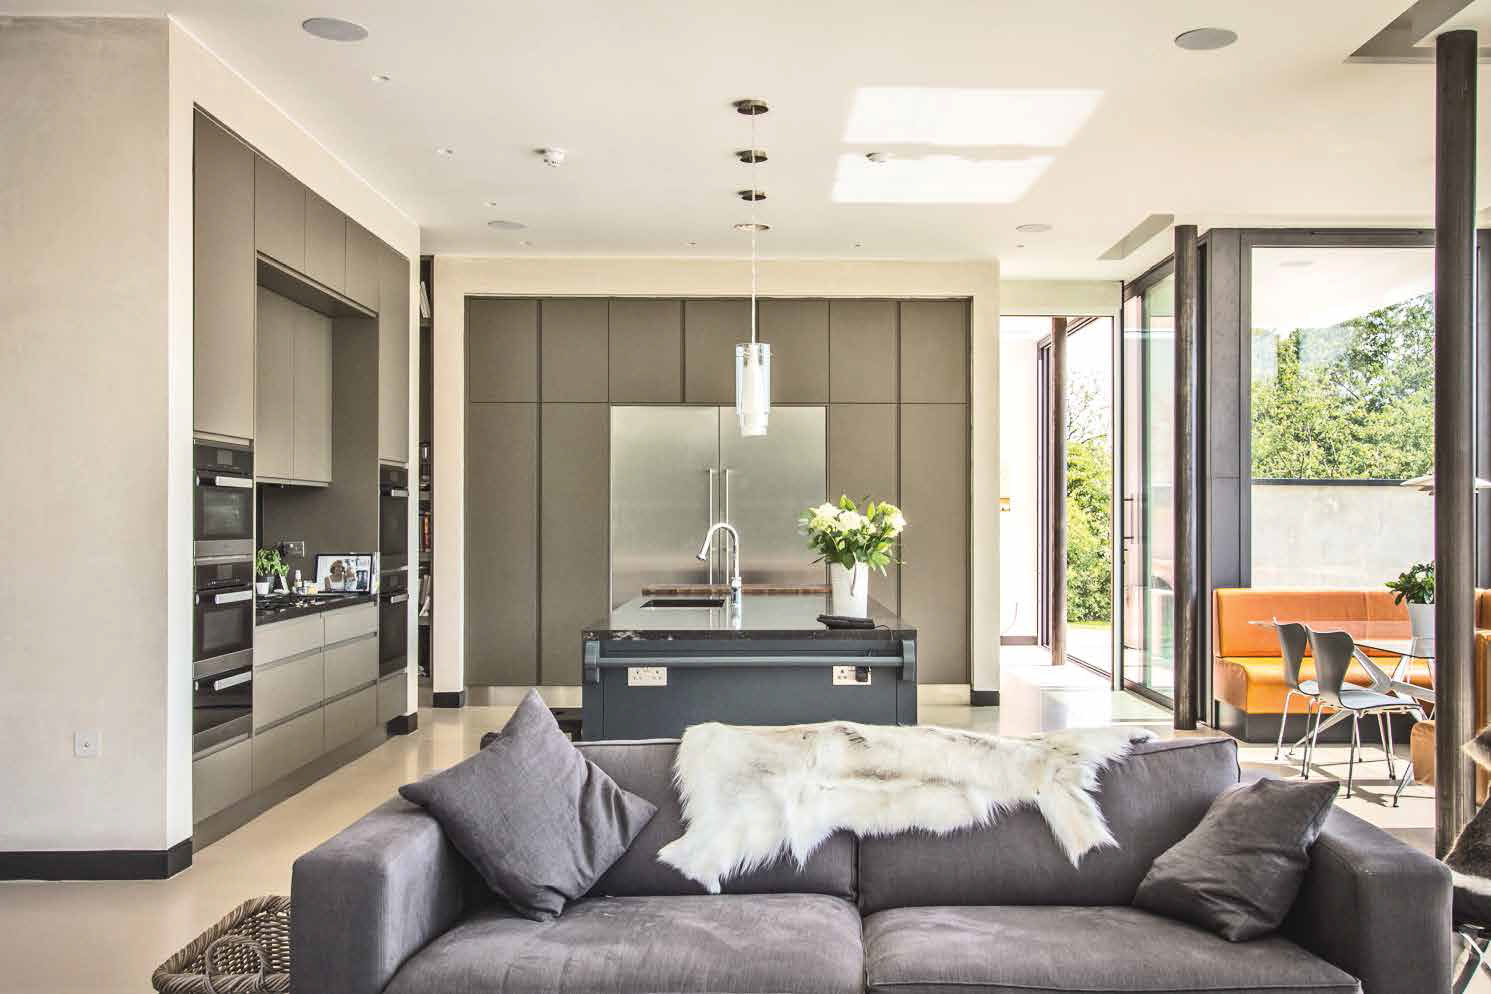 2017 CGA Residential - Countryhouse Portfolio_l-15.jpg